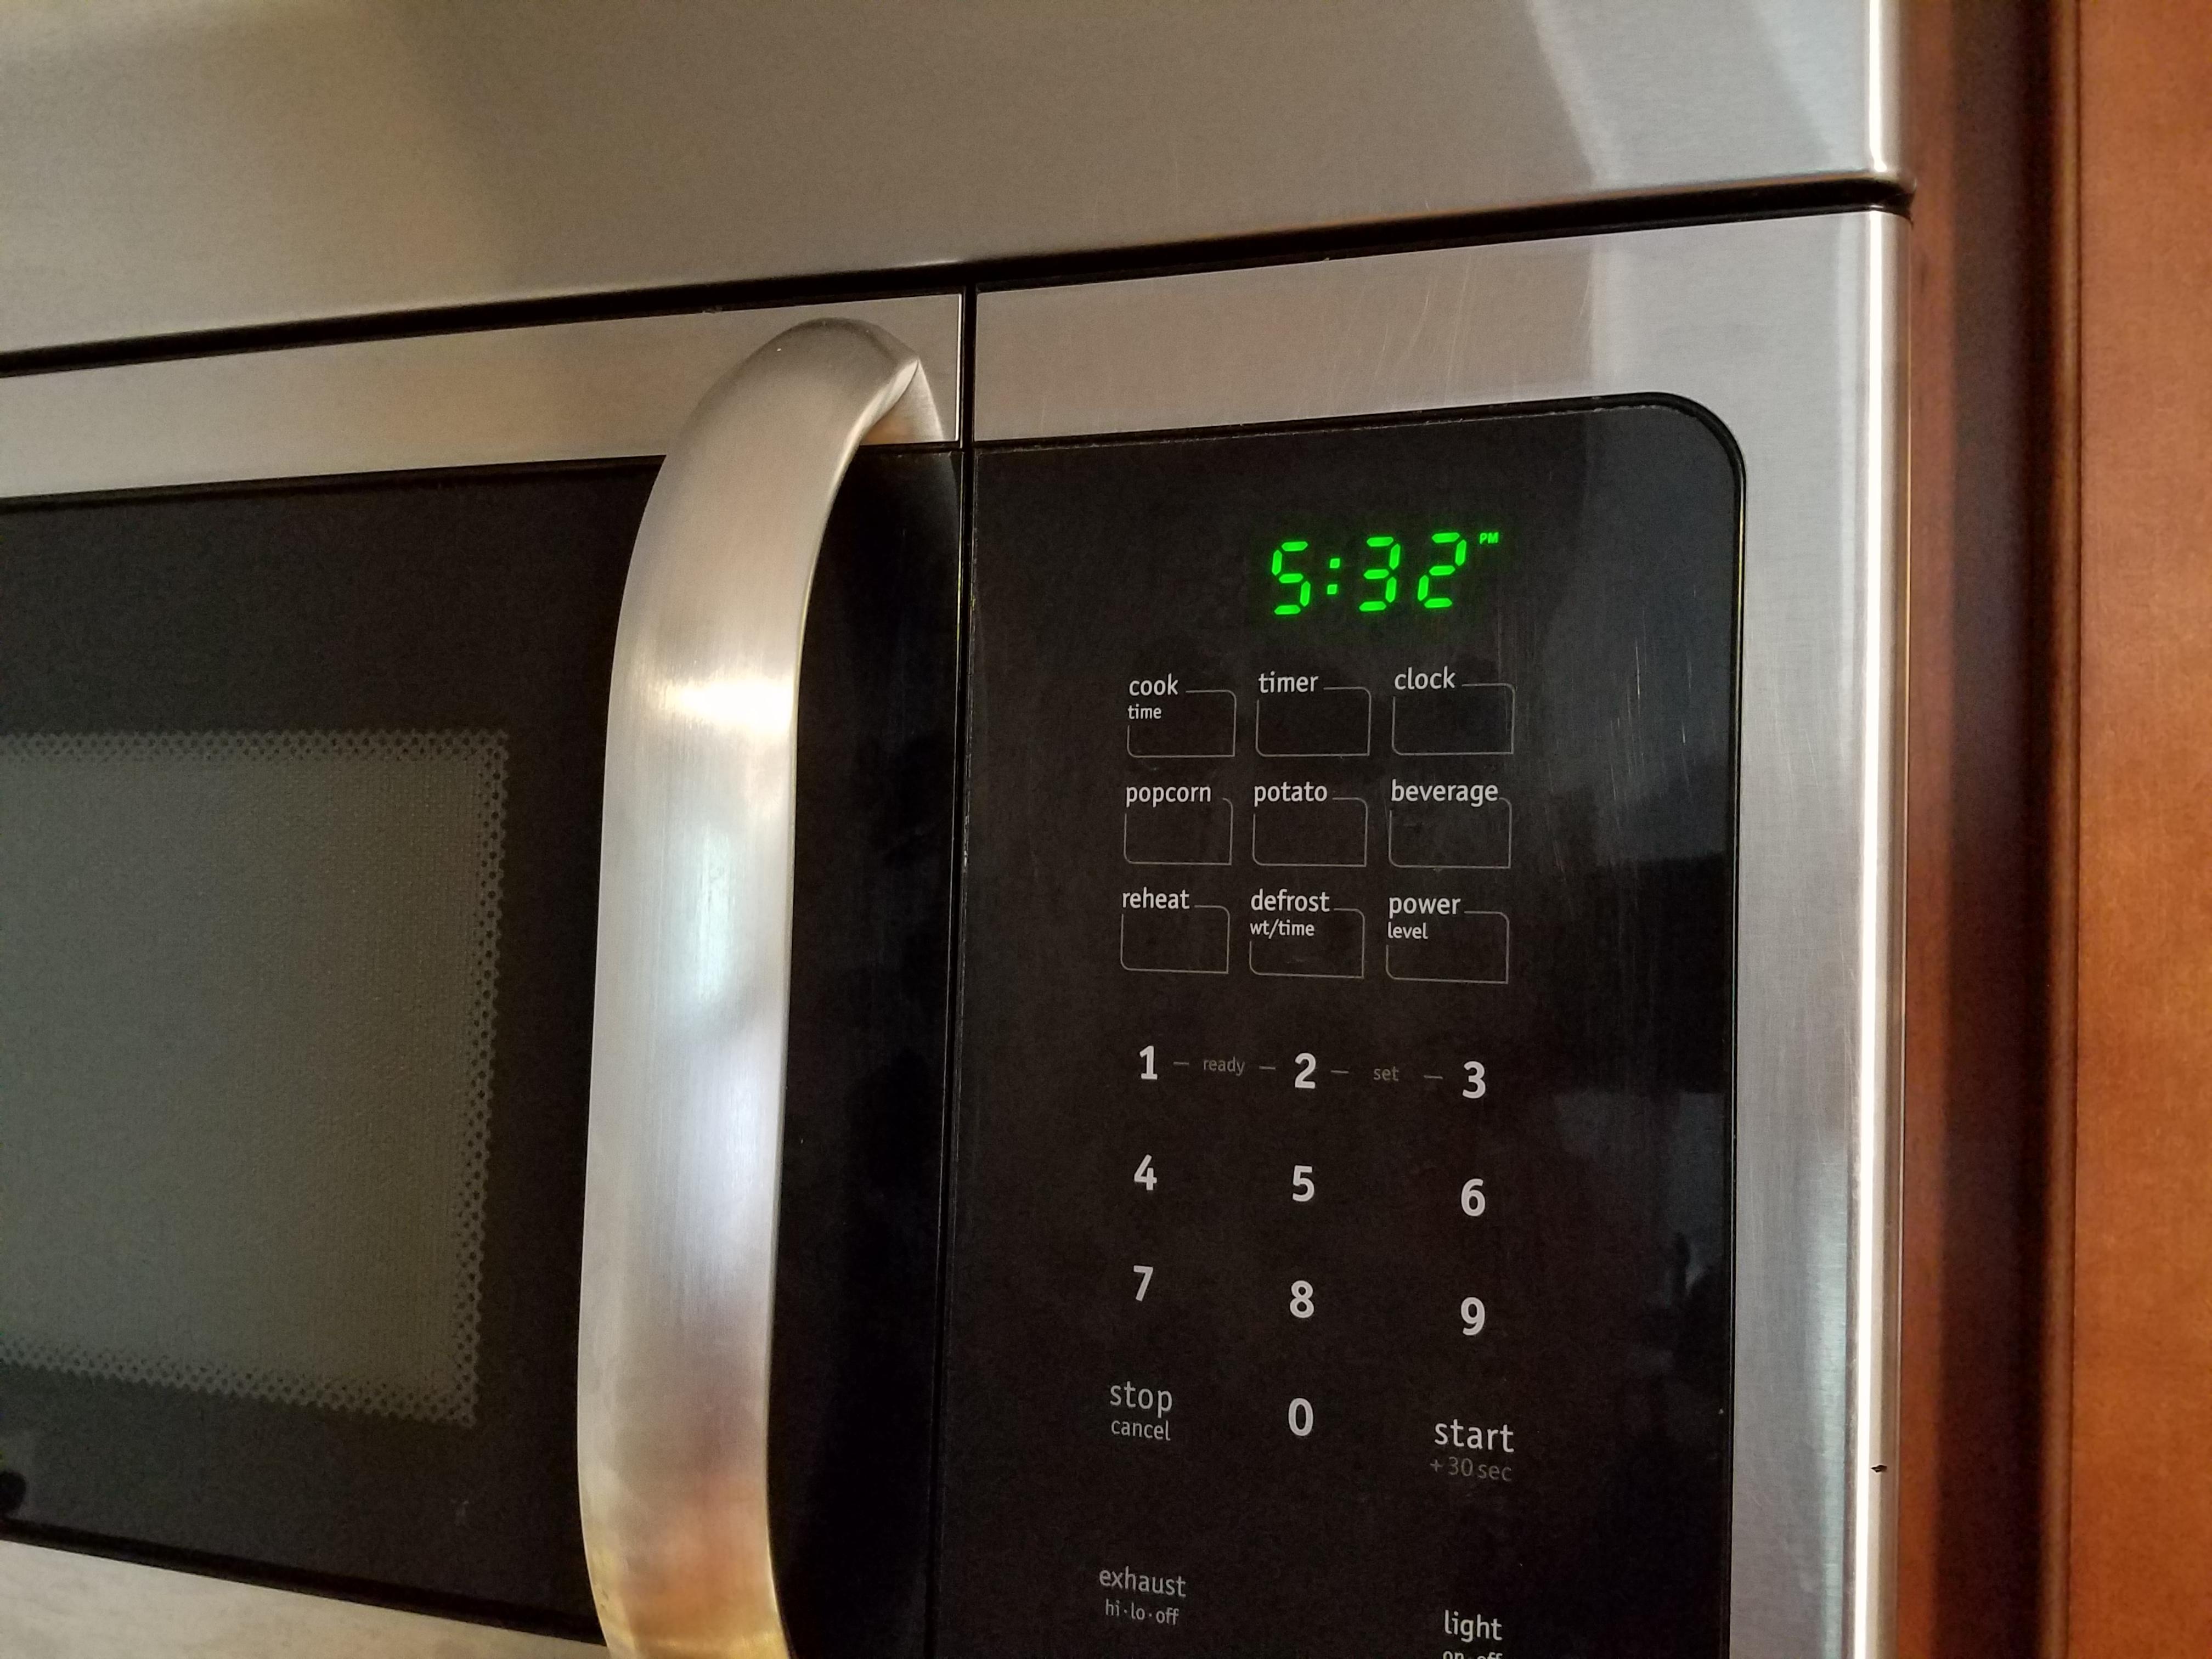 https commons wikimedia org wiki file frigidaire microwave clock 20200418 jpg